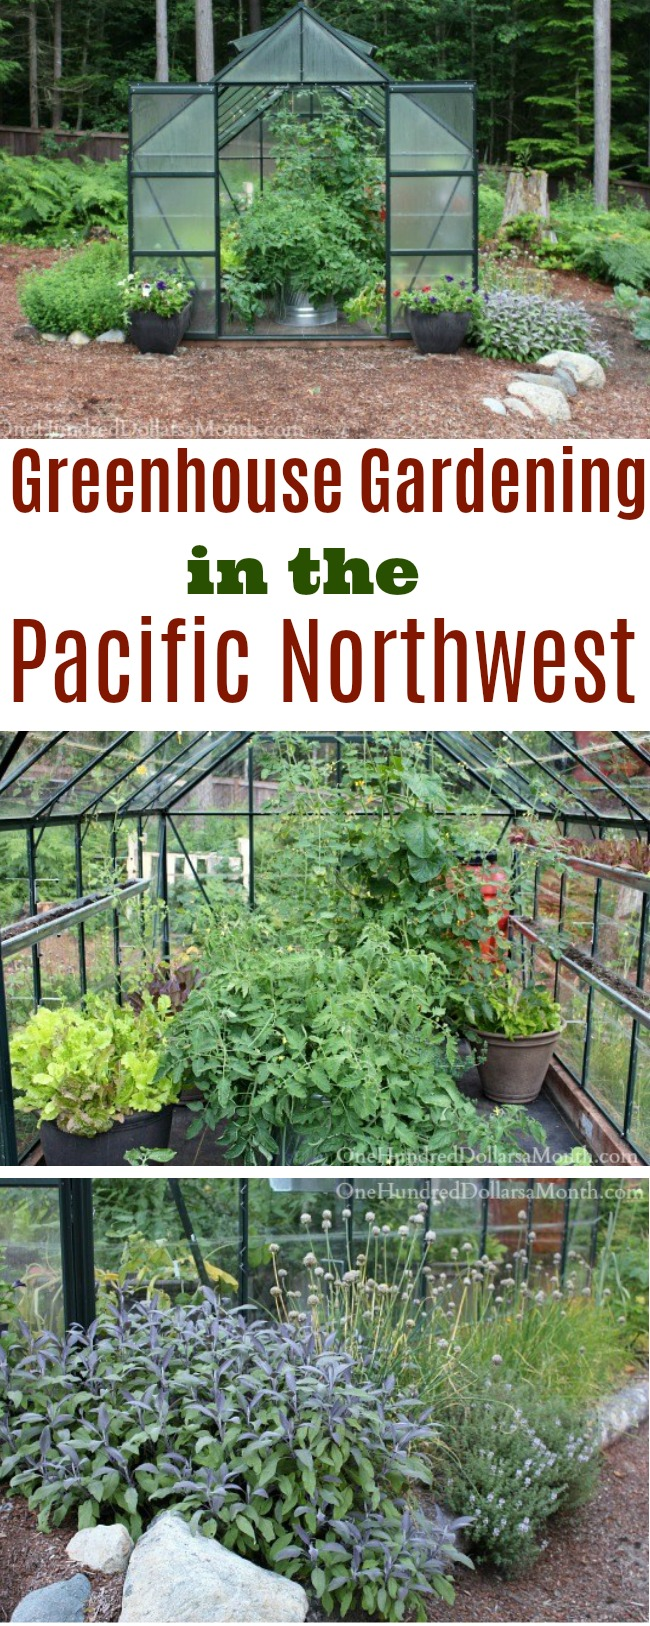 Daniels Pacific NW Garden: May 2014